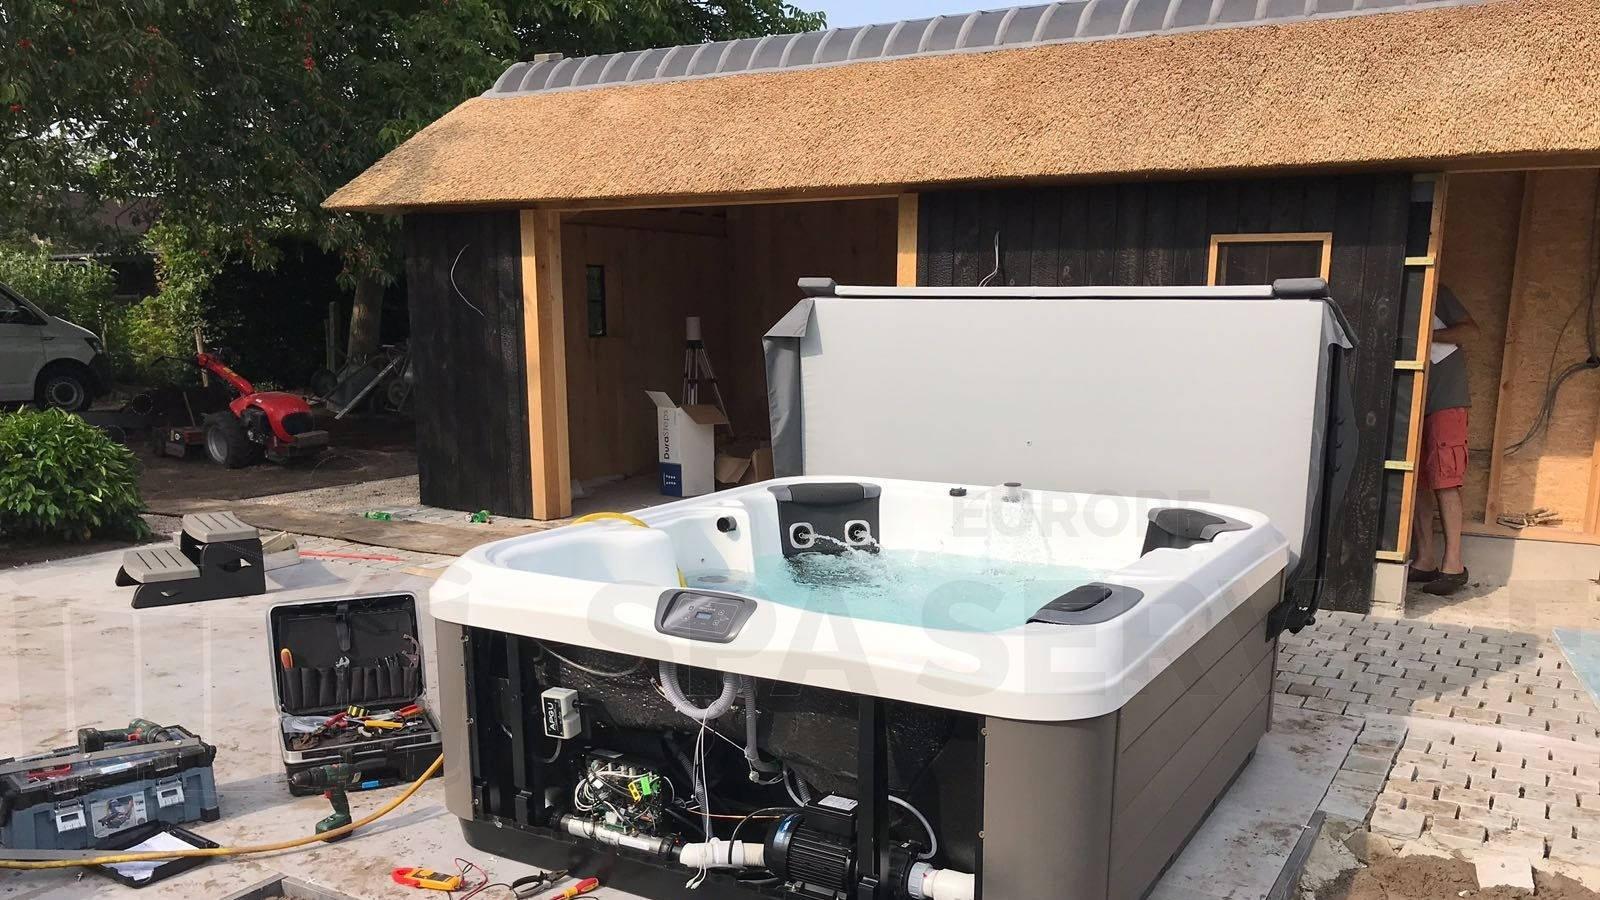 Plaatsing Villeroy & Boch R6LE spa in Stekene België